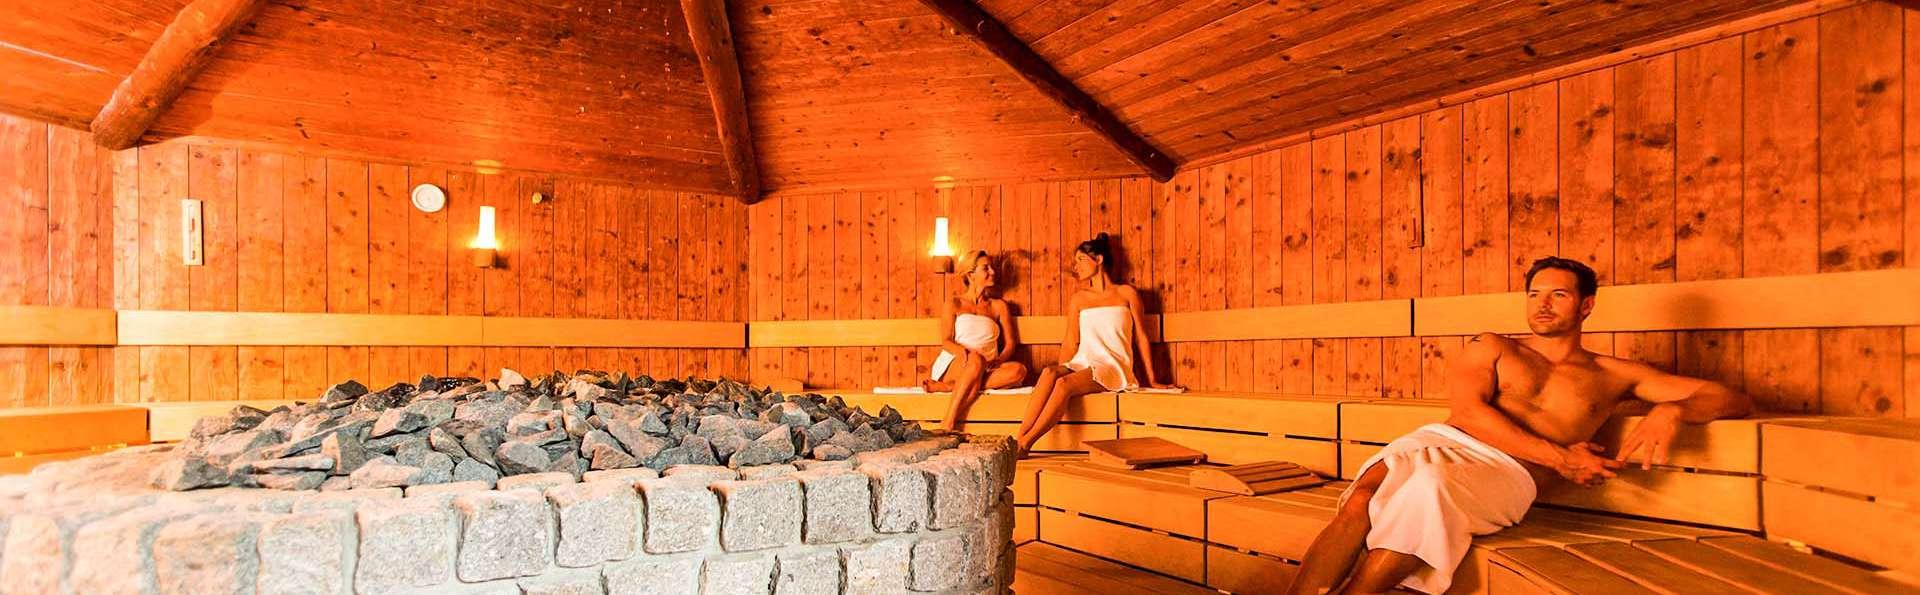 Spa Sport Hotel Zuiver - EDIT_SPA_04.jpg